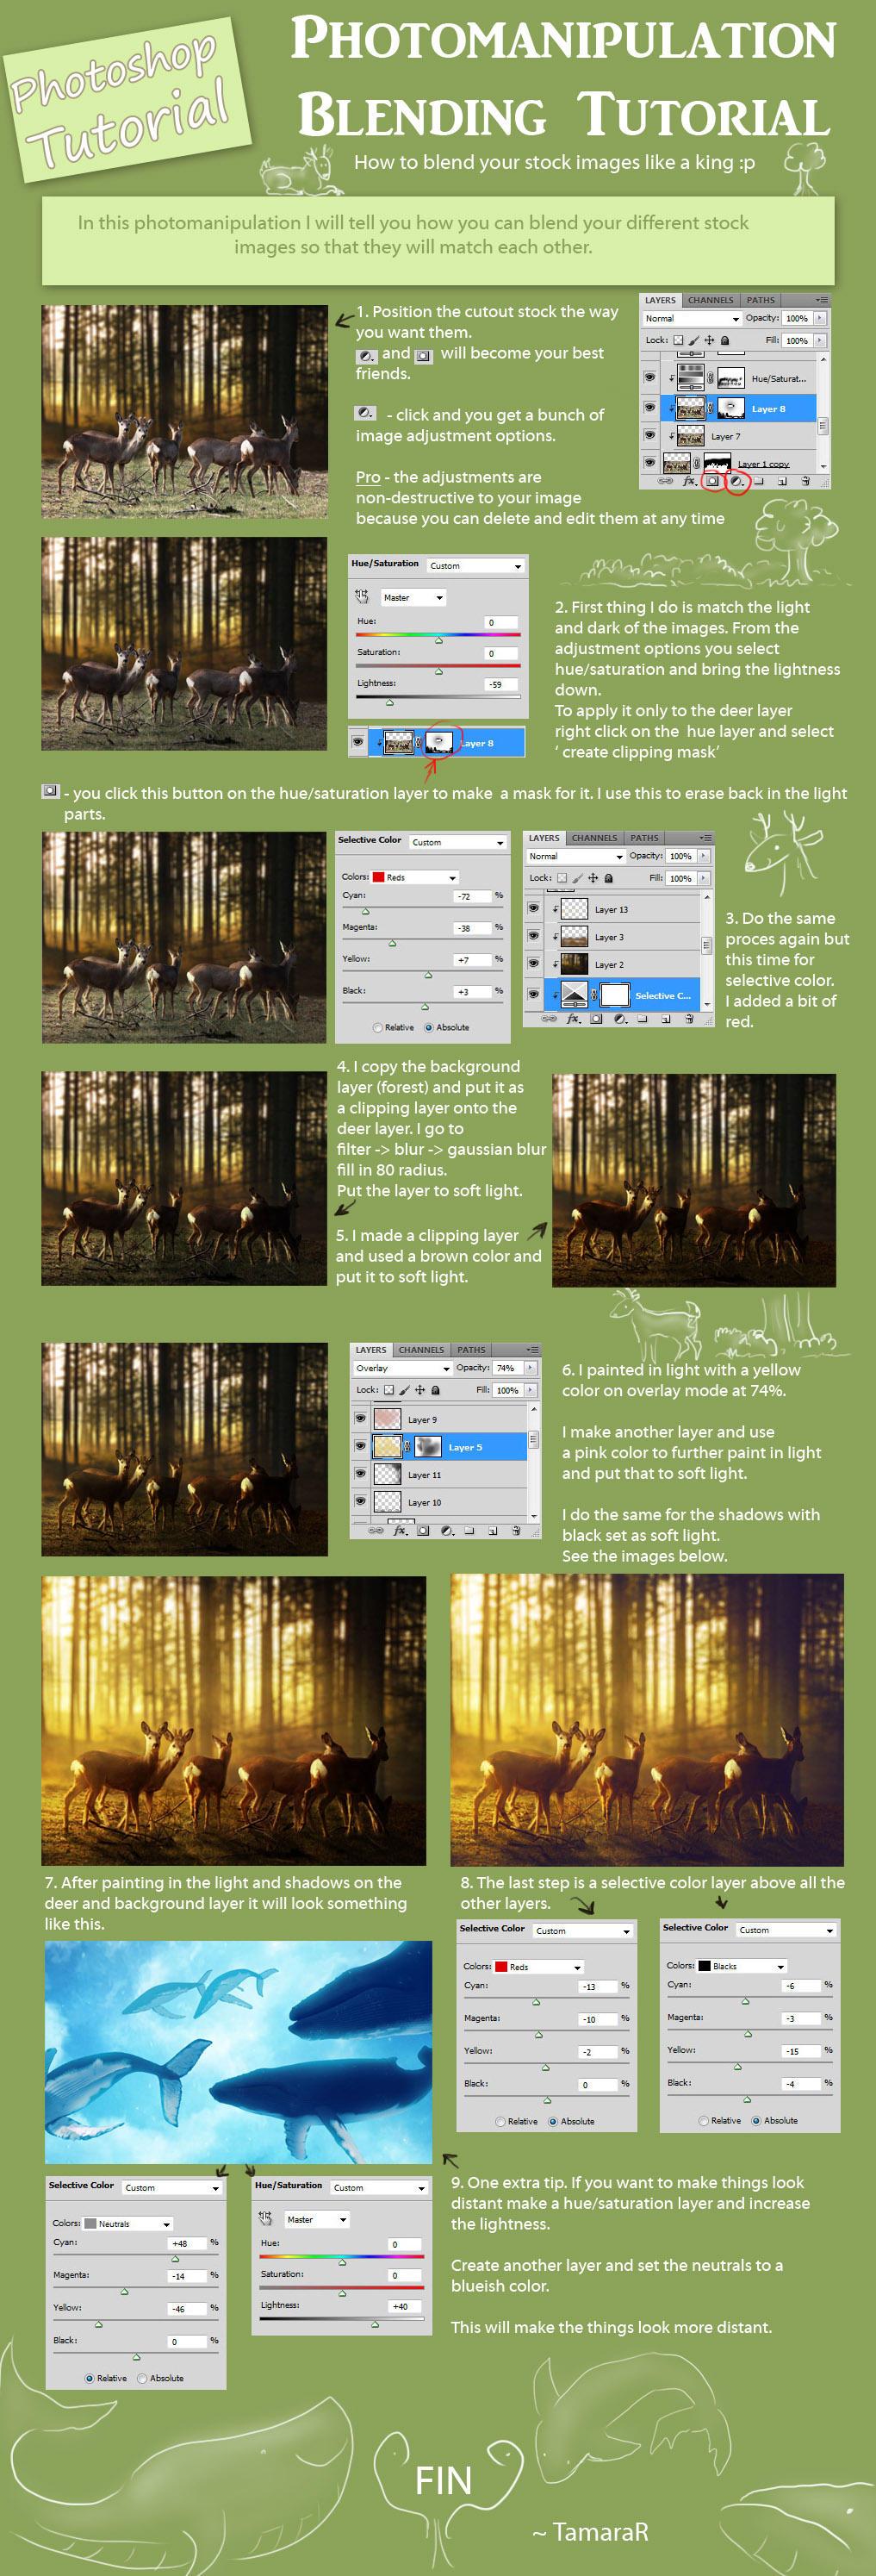 Photomanipulation Tutorial  on blending by tamaraR